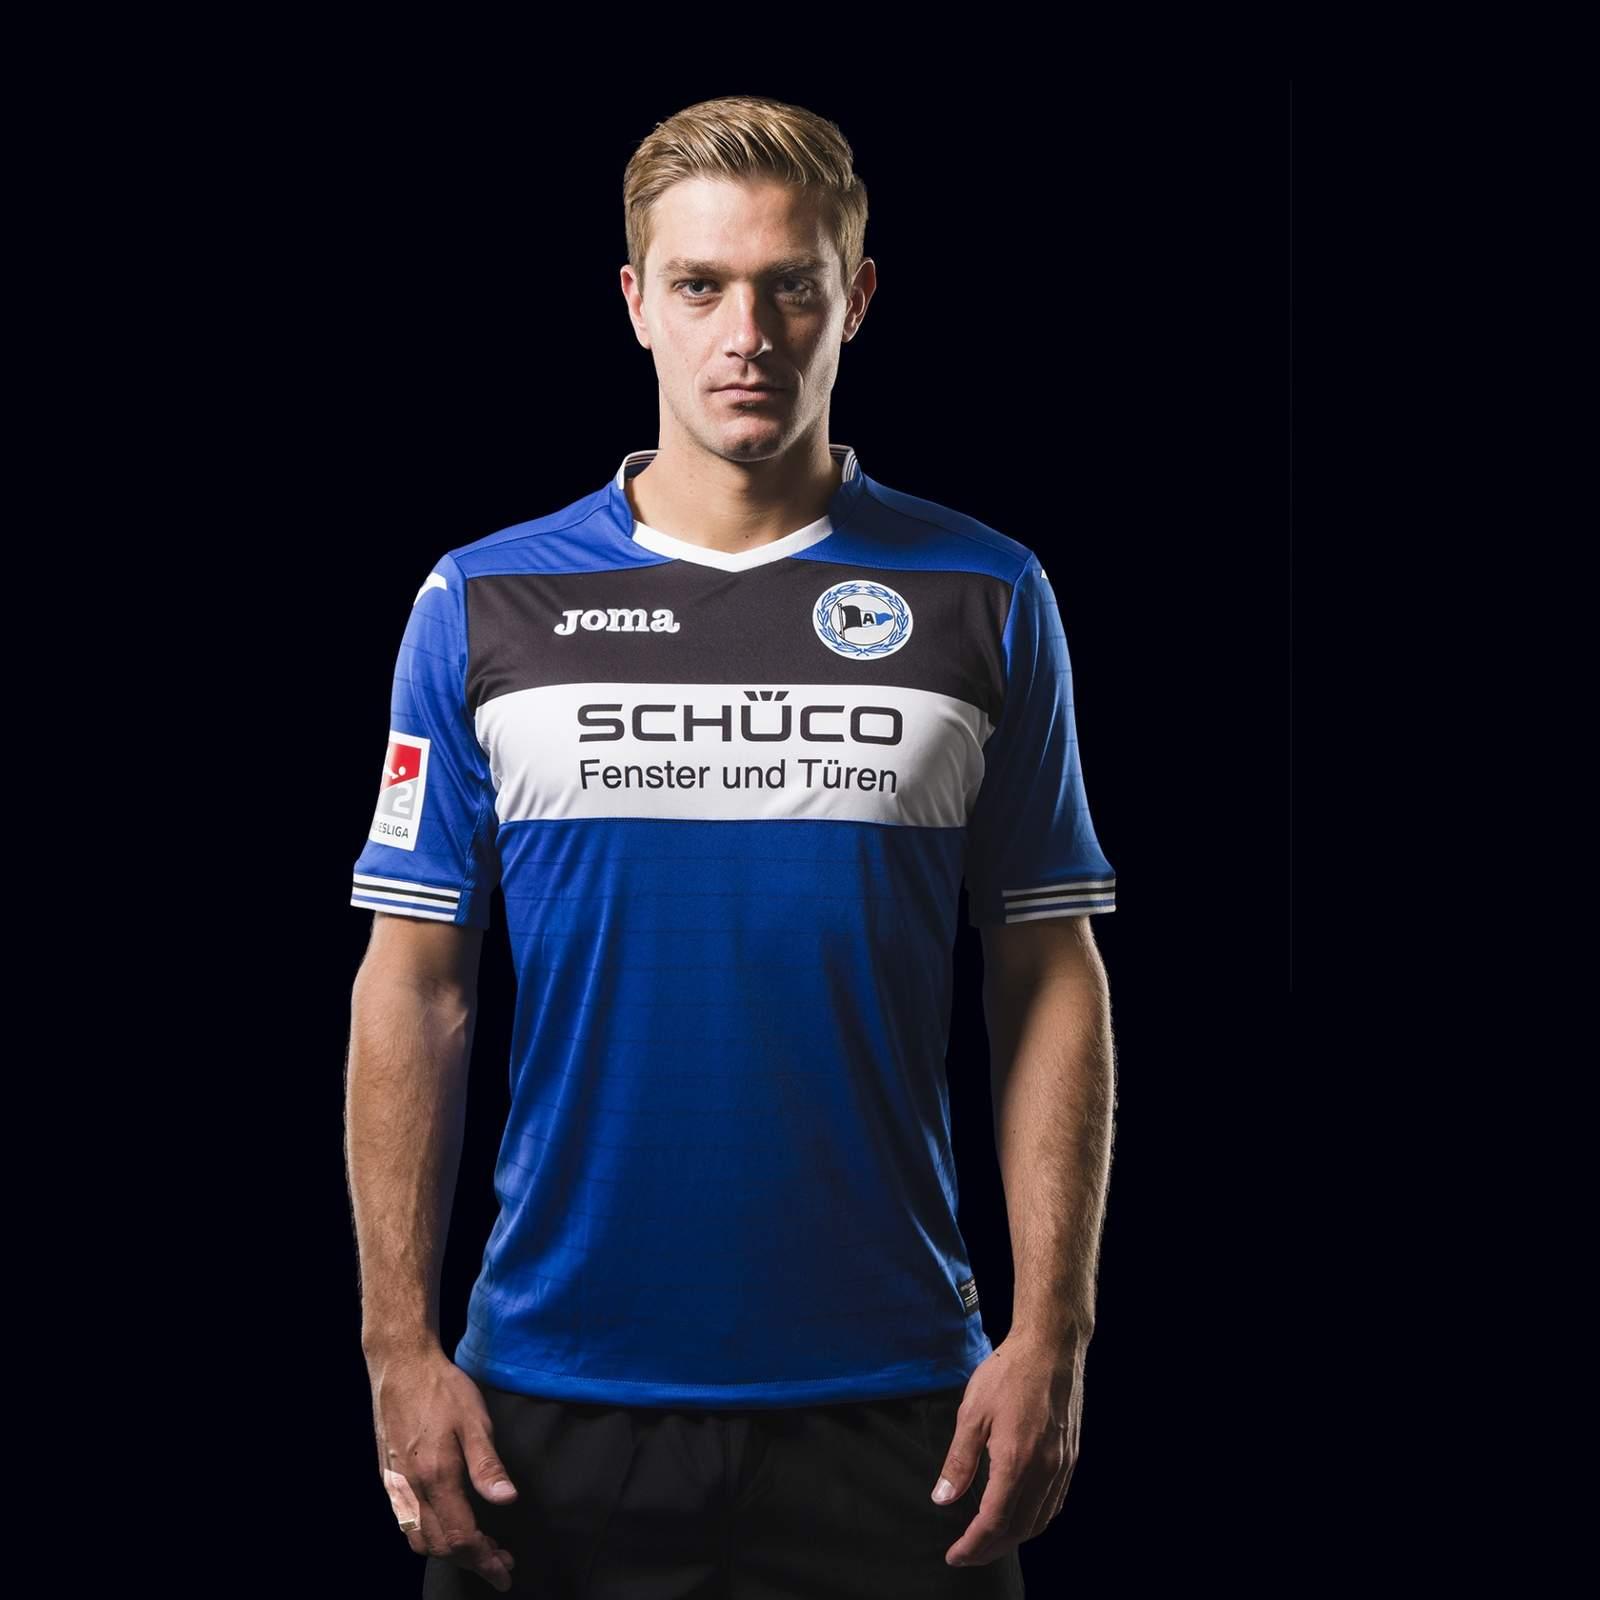 Türen Bielefeld joma arminia bielefeld 17 18 kits revealed footy headlines